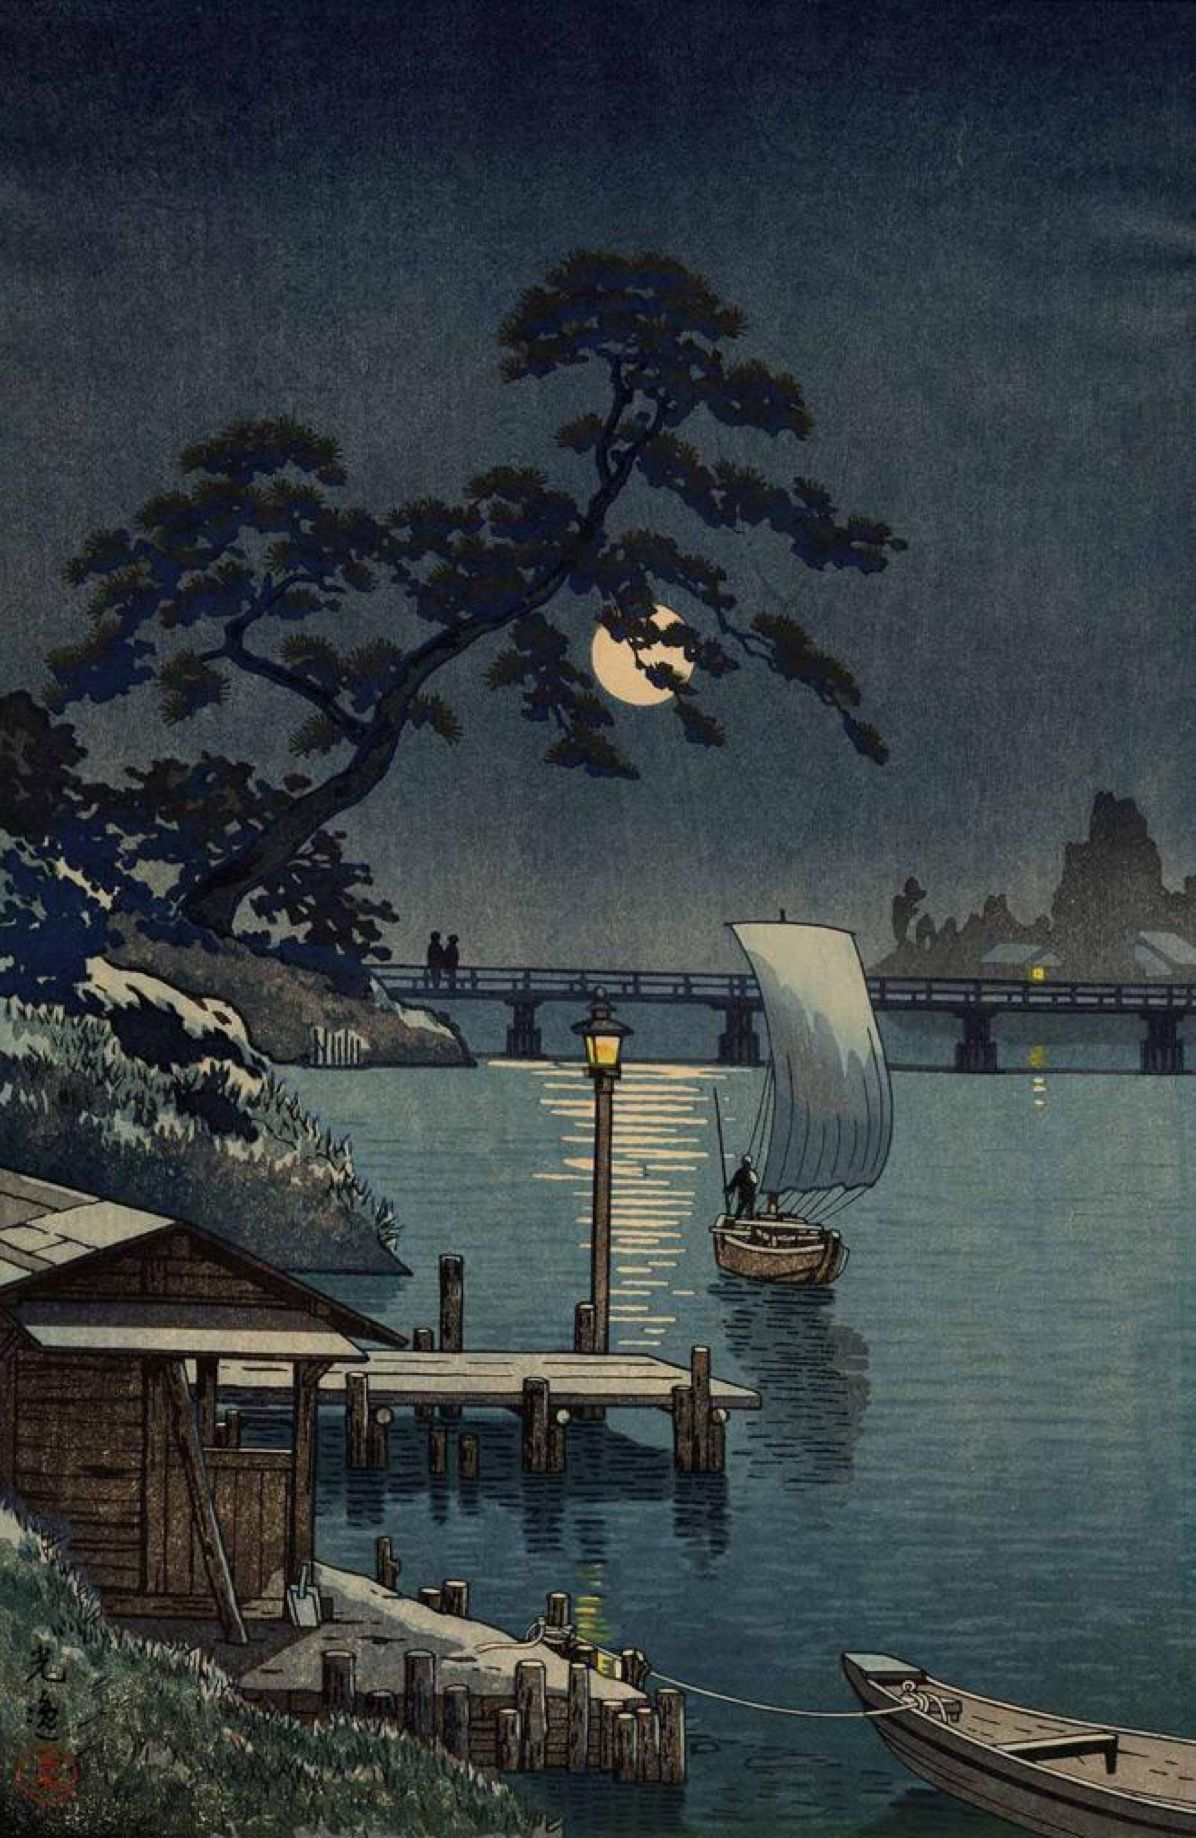 pin oleh brad van fossen di i love japan pemandangan khayalan pemandangan seni jepang